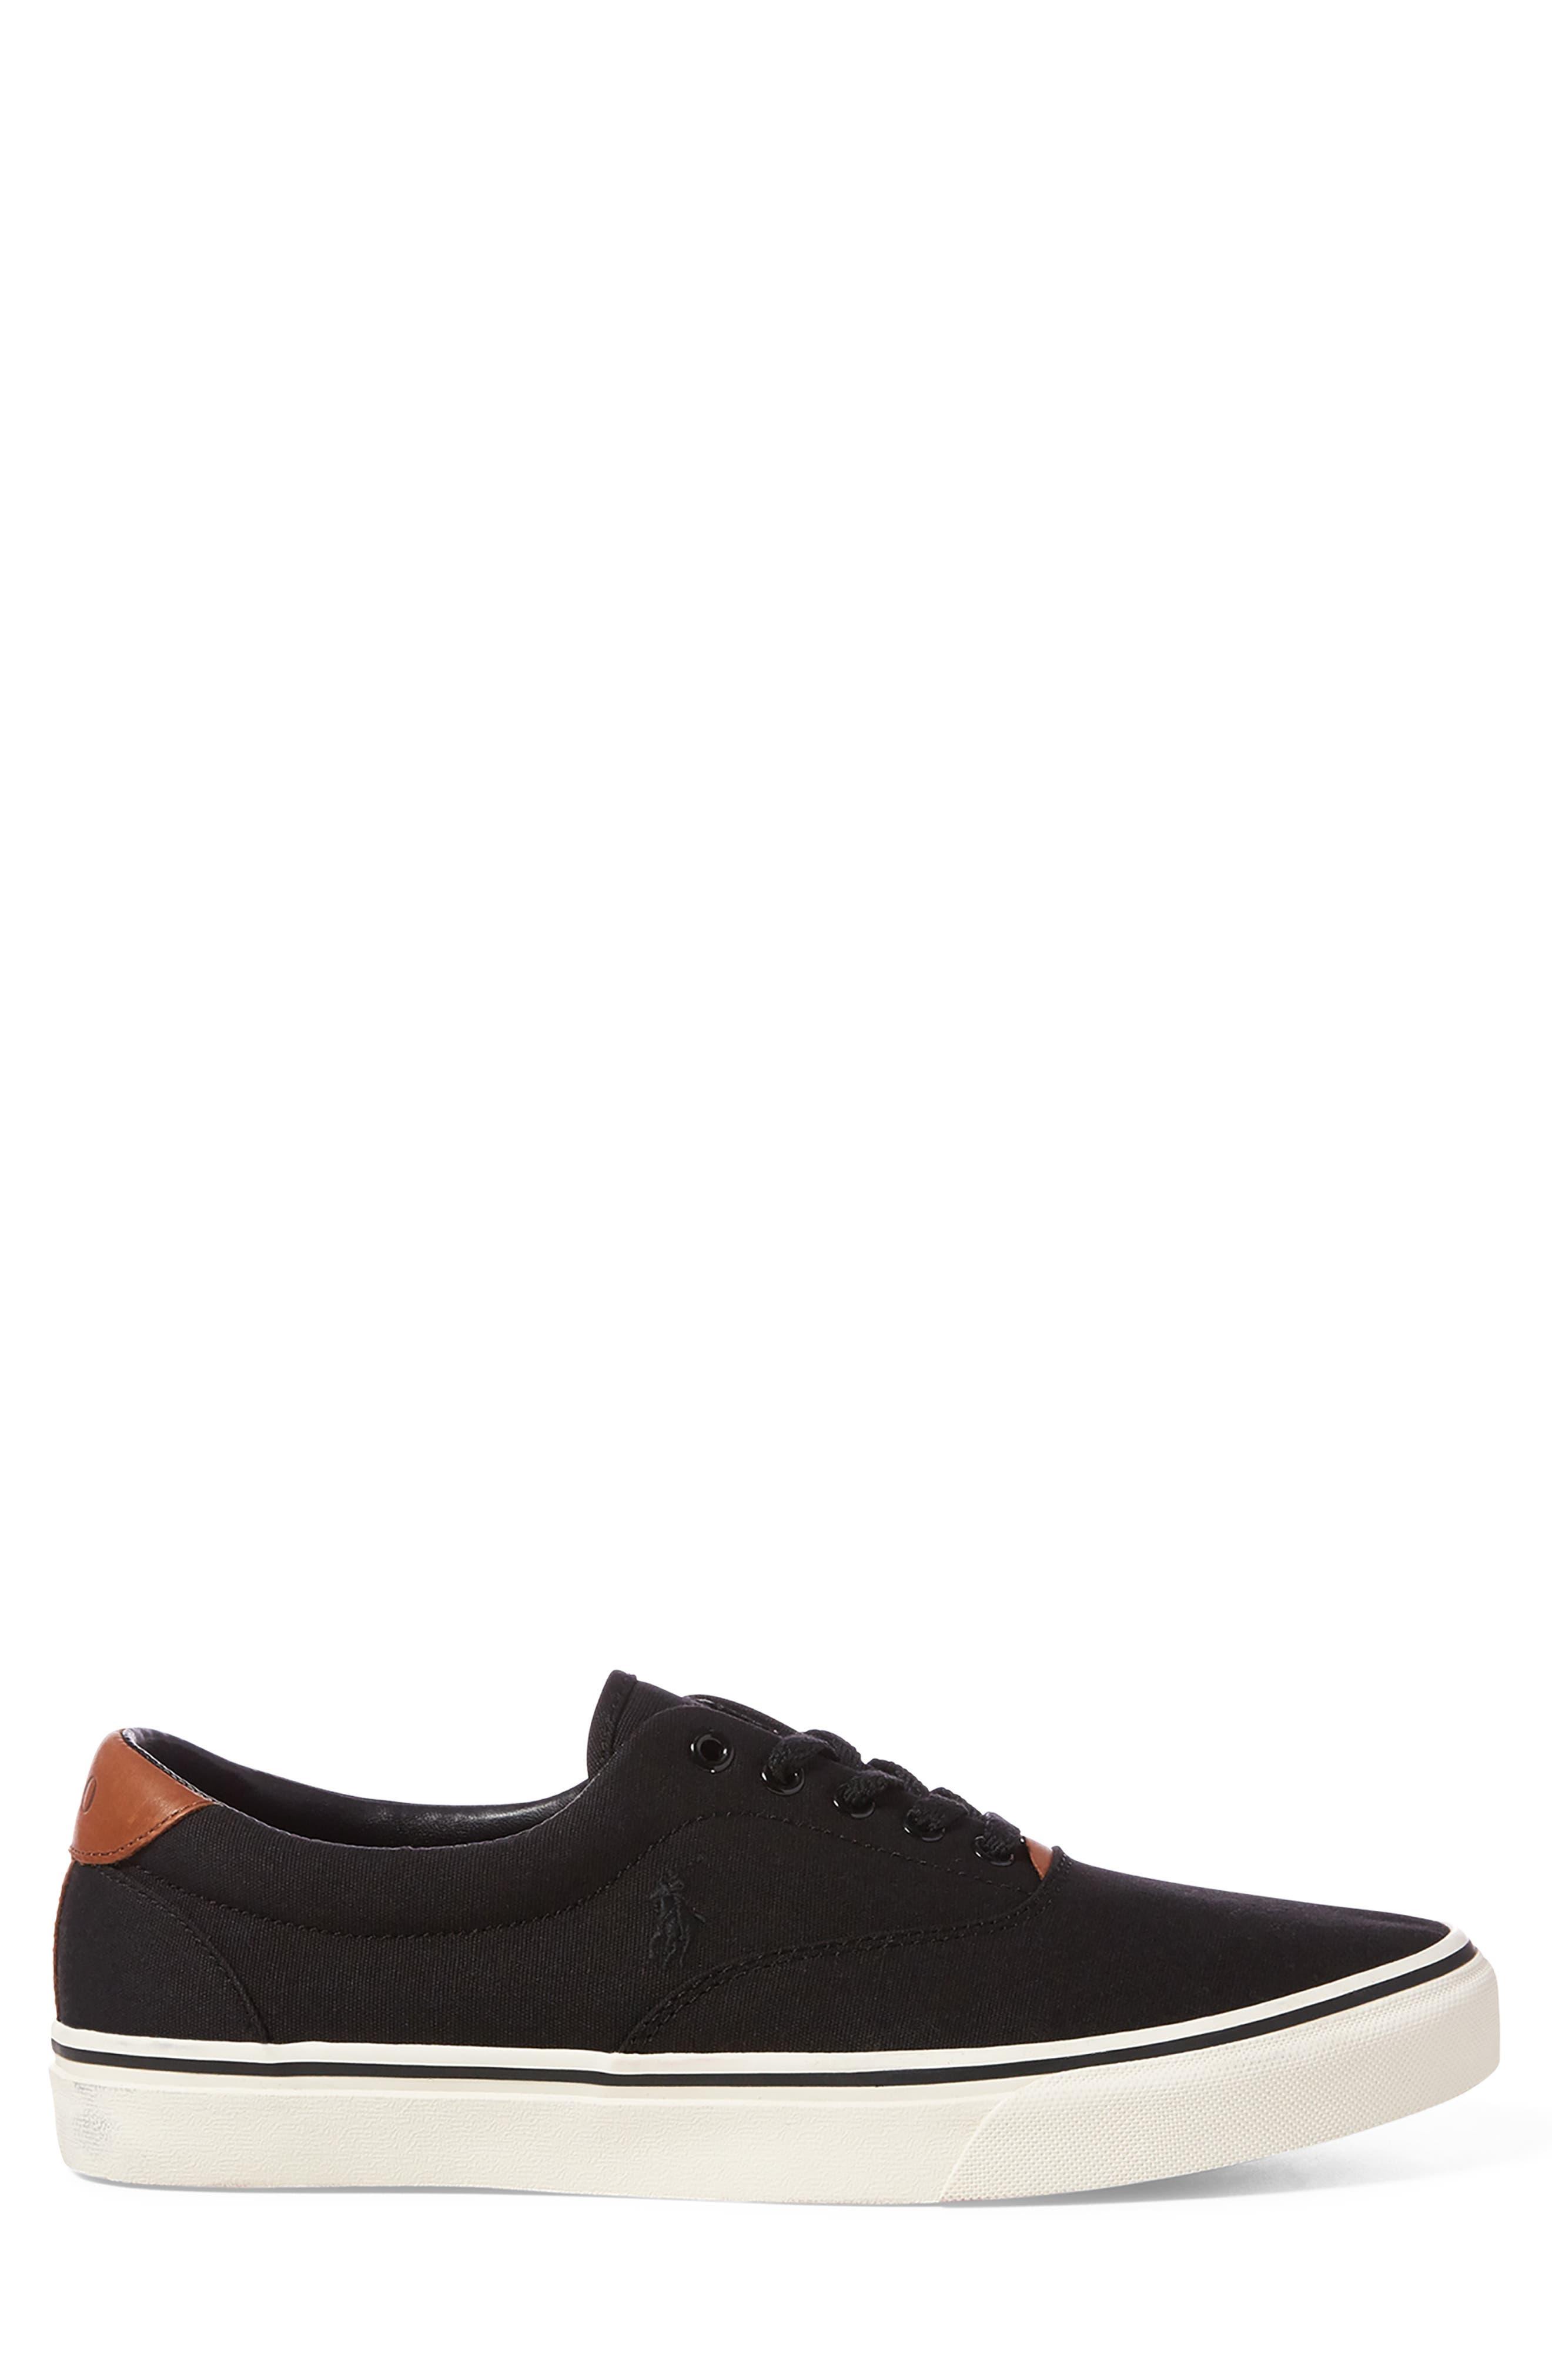 POLO RALPH LAUREN, Thorton Low Top Sneaker, Alternate thumbnail 2, color, BLACK CANVAS